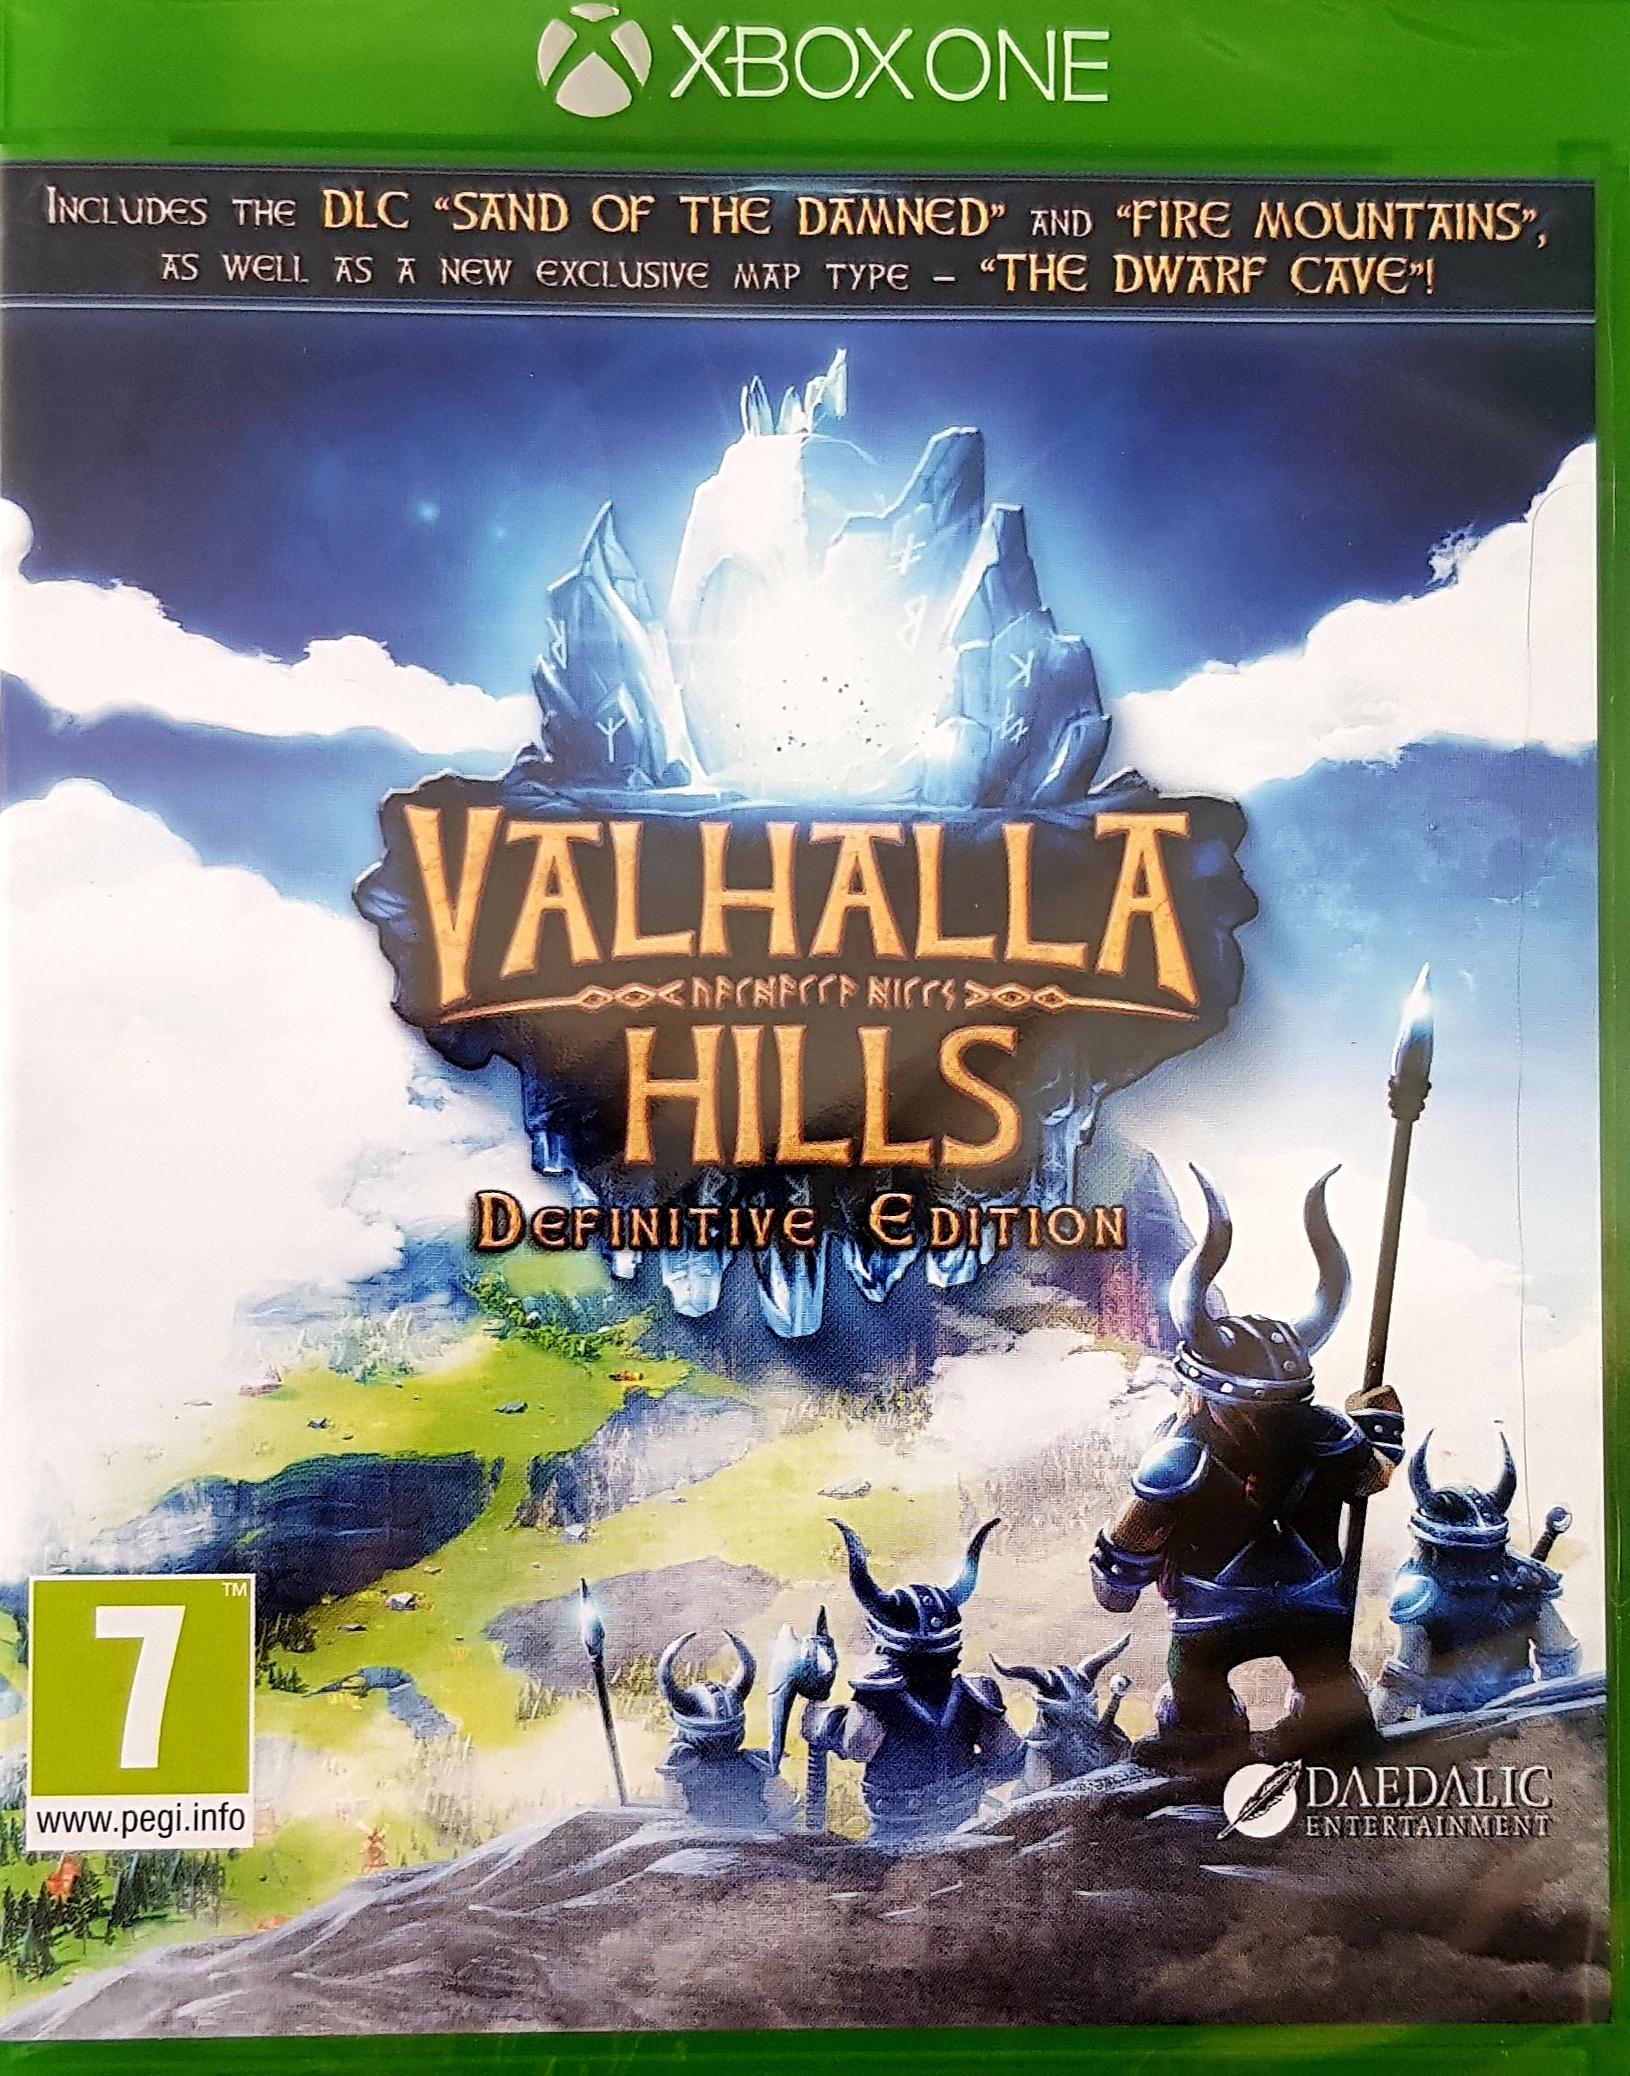 Valhalla Hills Definitive Edition za 18,99 zł i PS4 za 24,99 zł